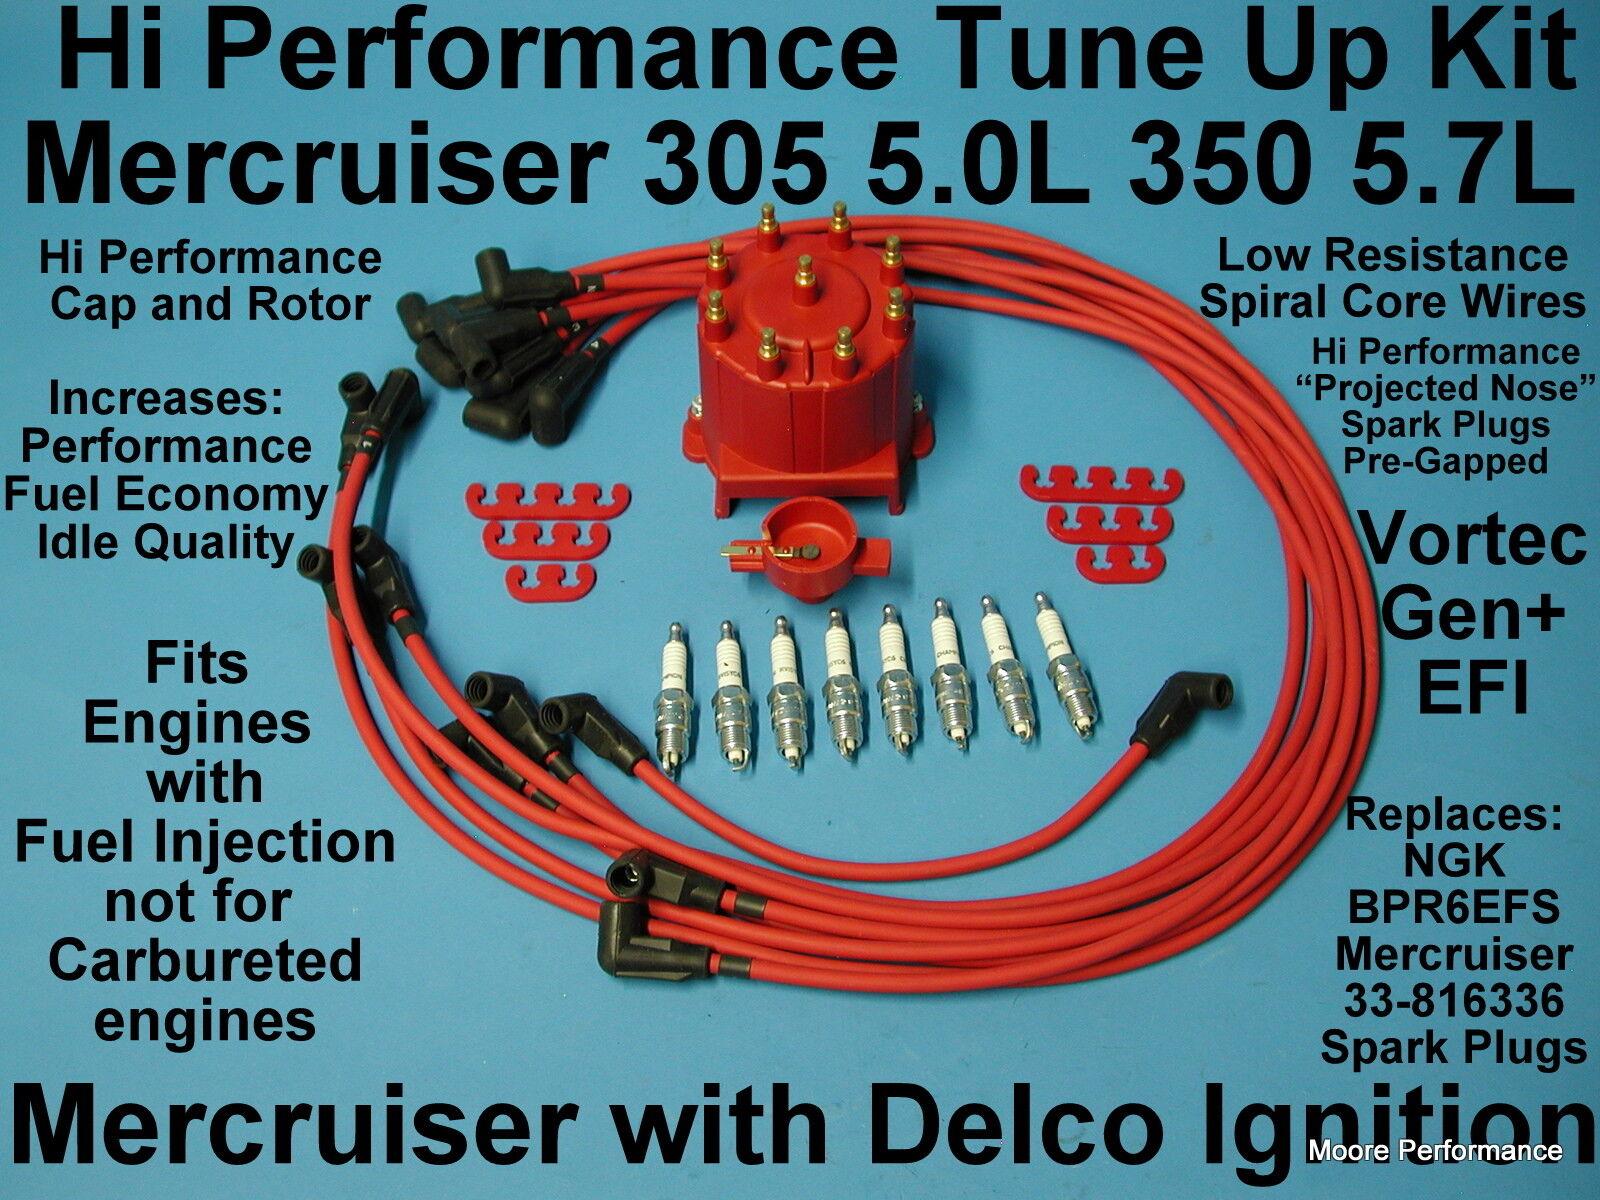 Tune up Mercruiser Gen Vortec MPI 305 350 Spark Plug Wire ...